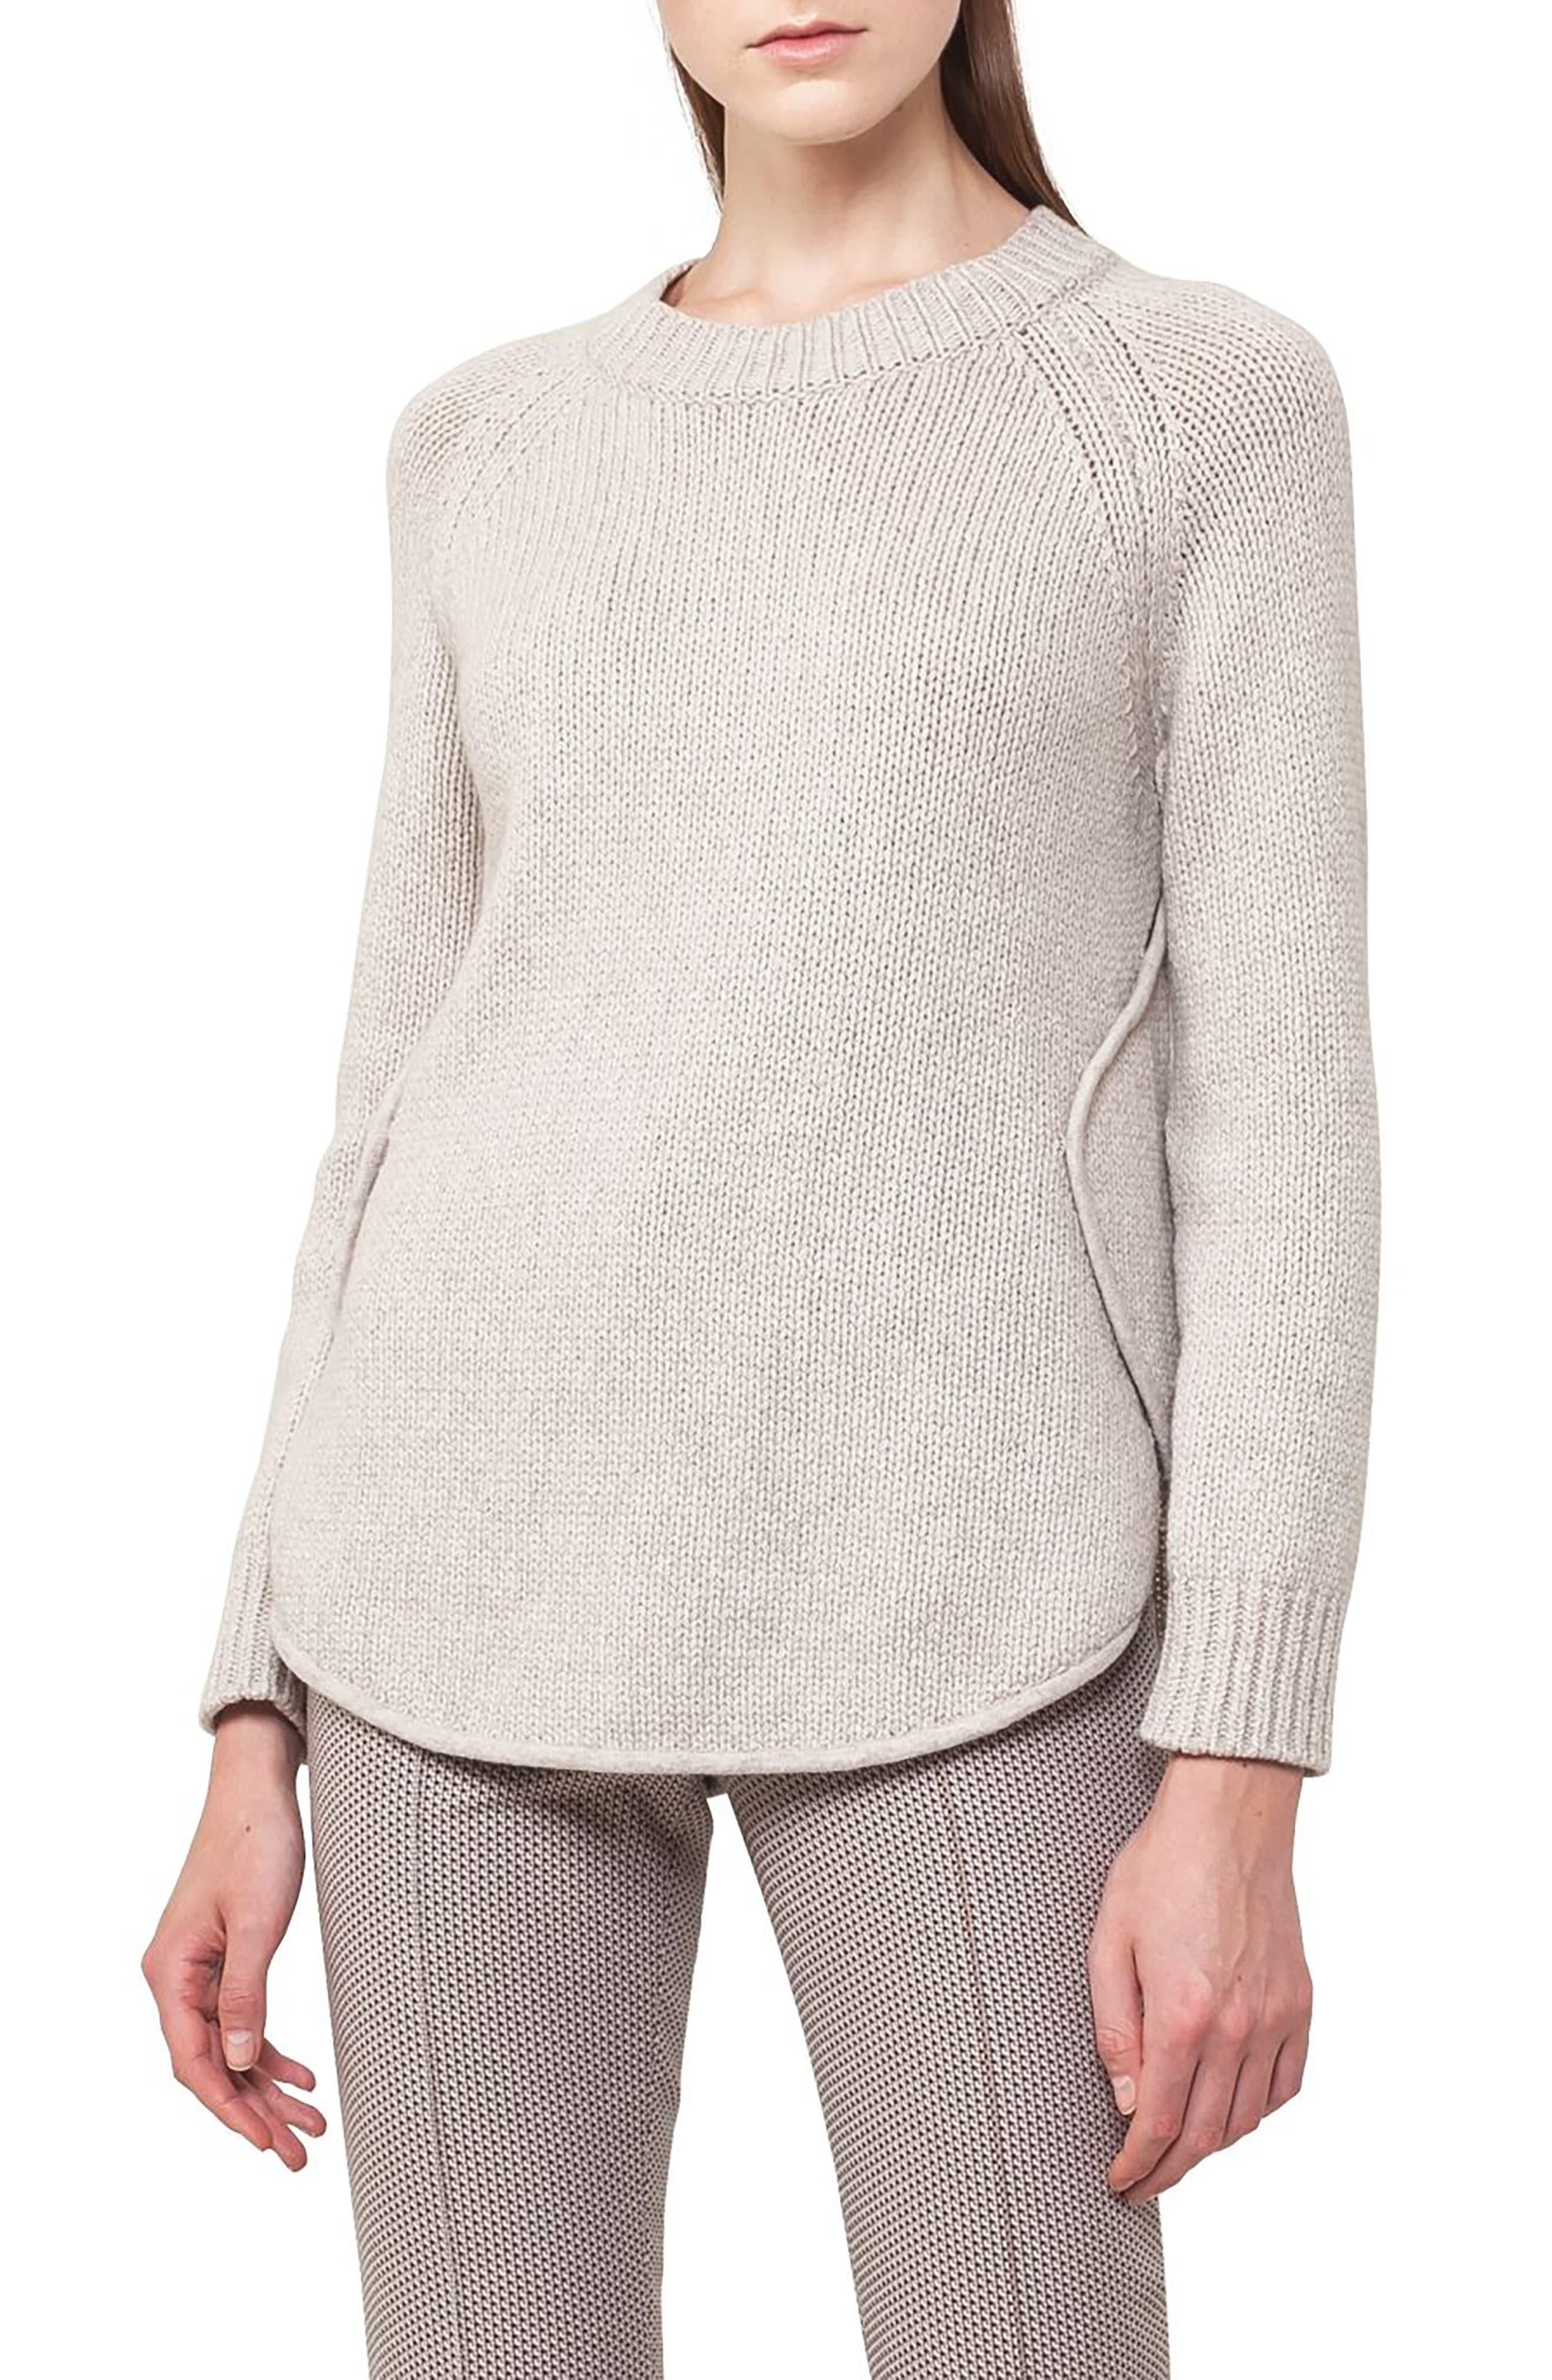 Quadrant Circle Cashmere Blend Pullover,                         Main,                         color, Taupe